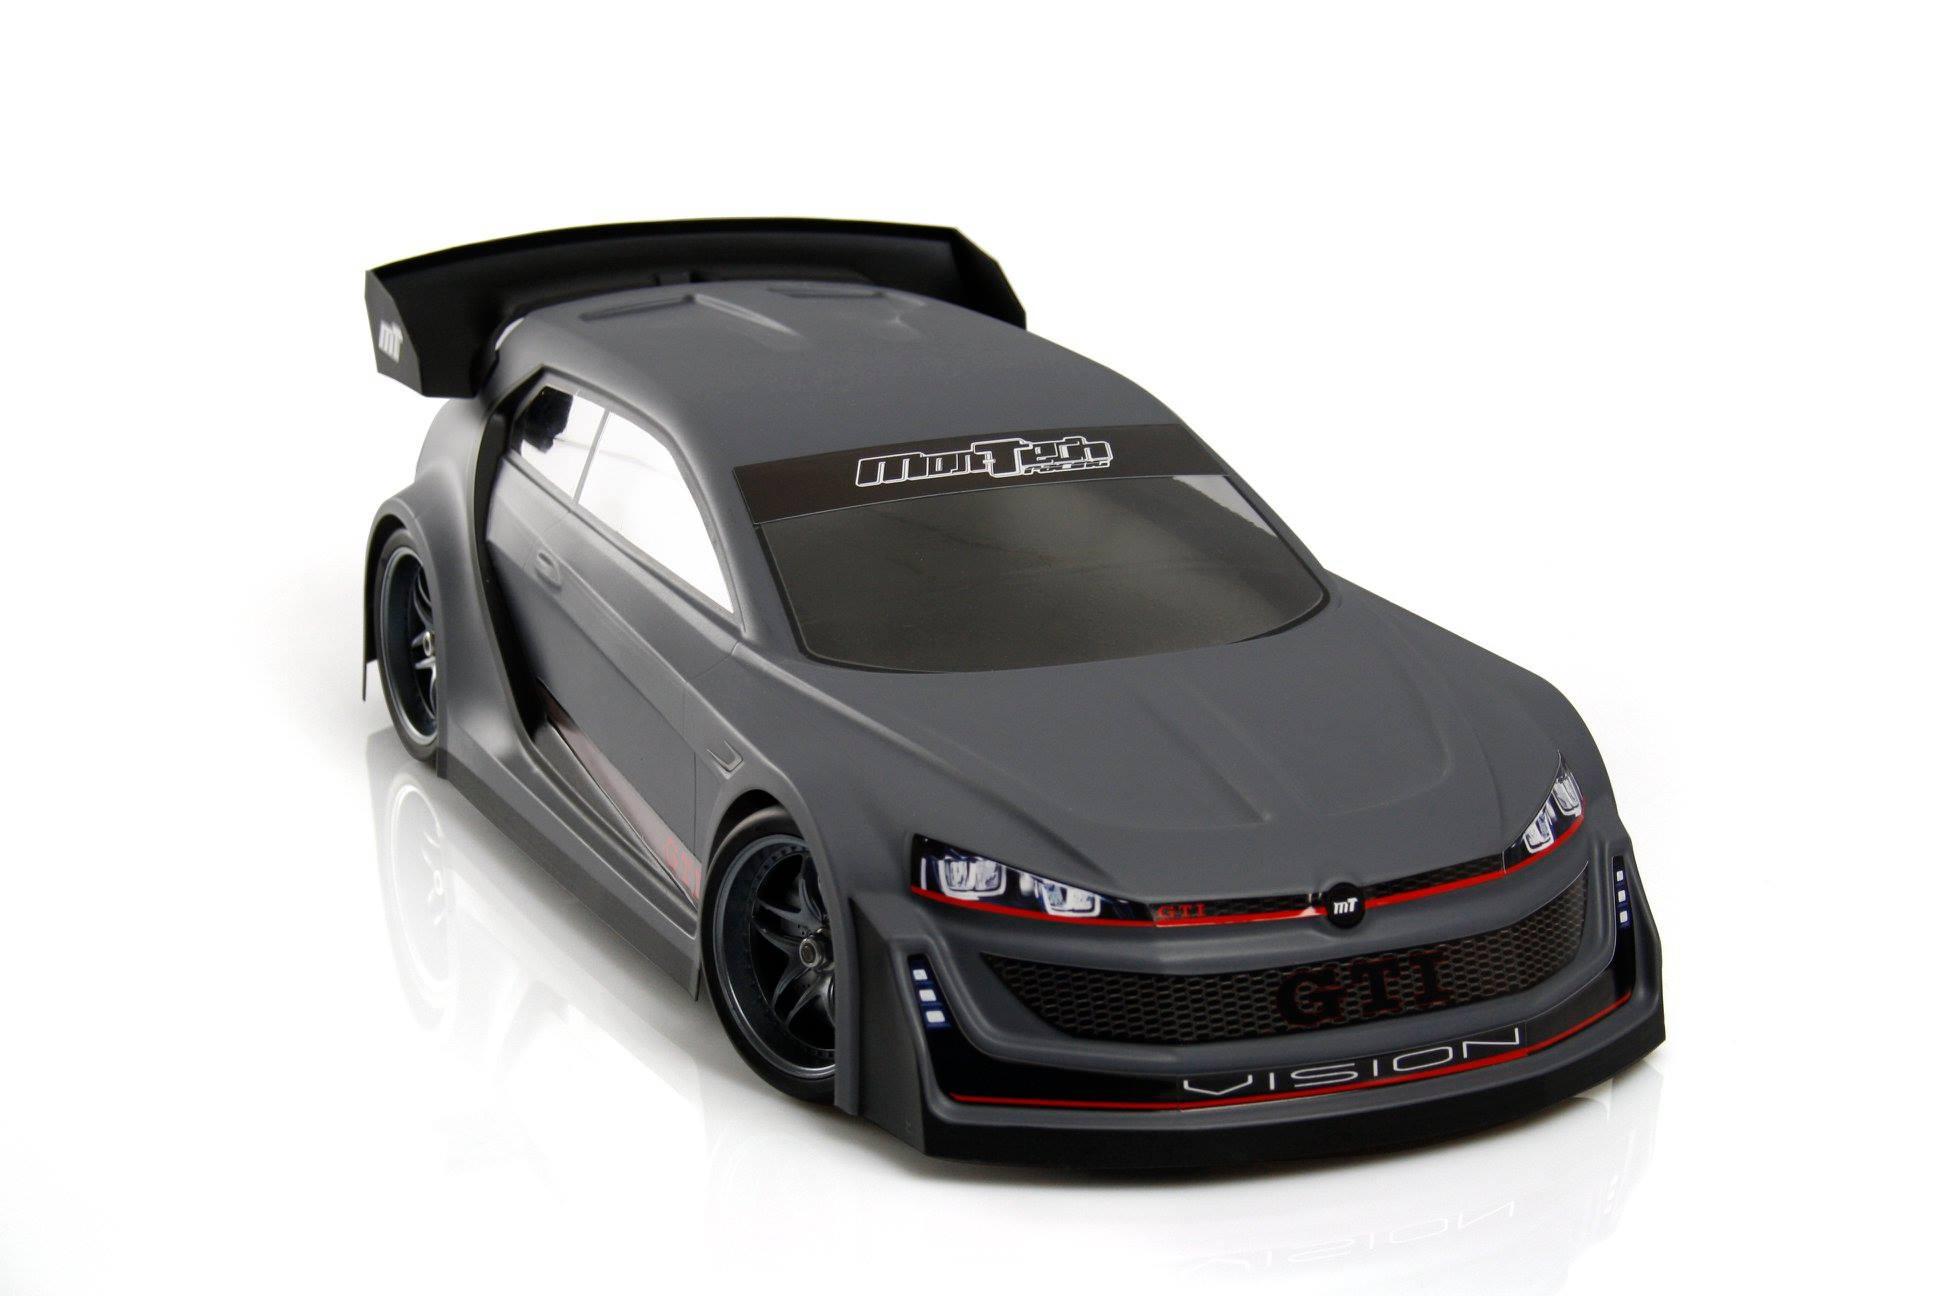 Mon-tech Racing GTI Vision FWD R/C Car Body